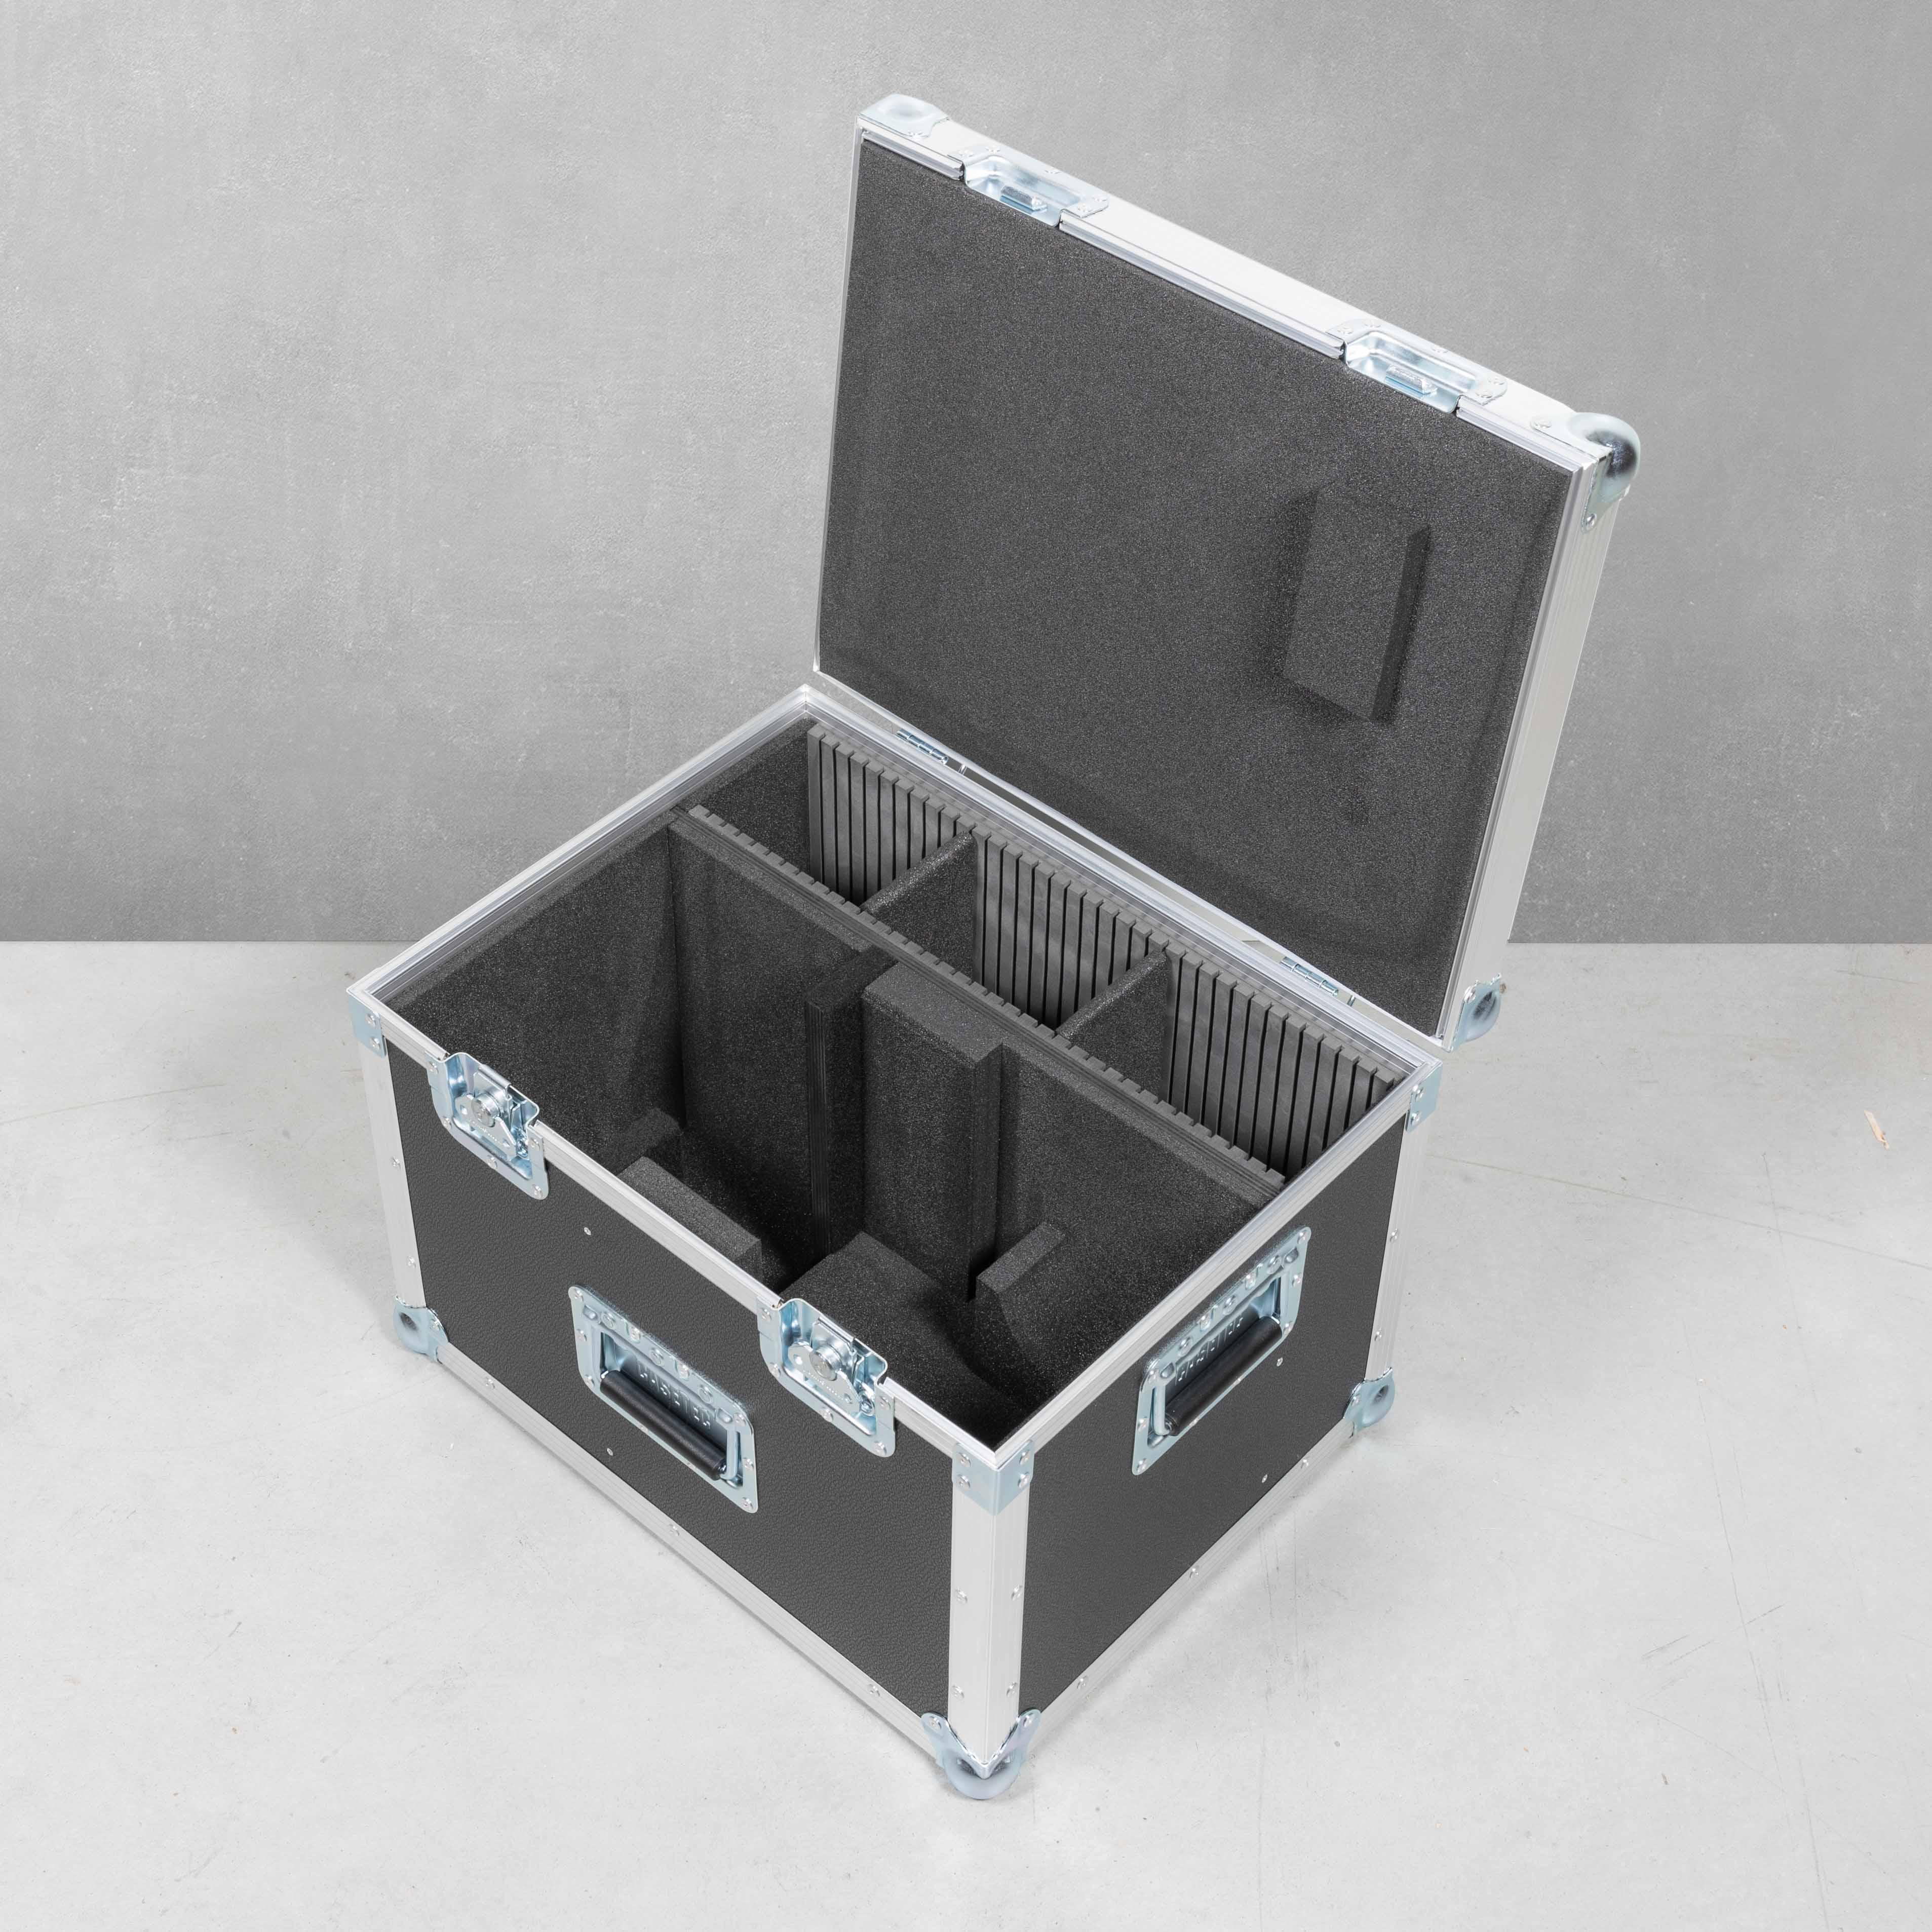 Koffer für Panasonic AW-UE150WP/ UE150KP / UE150WE / UE150KE + Zubehör